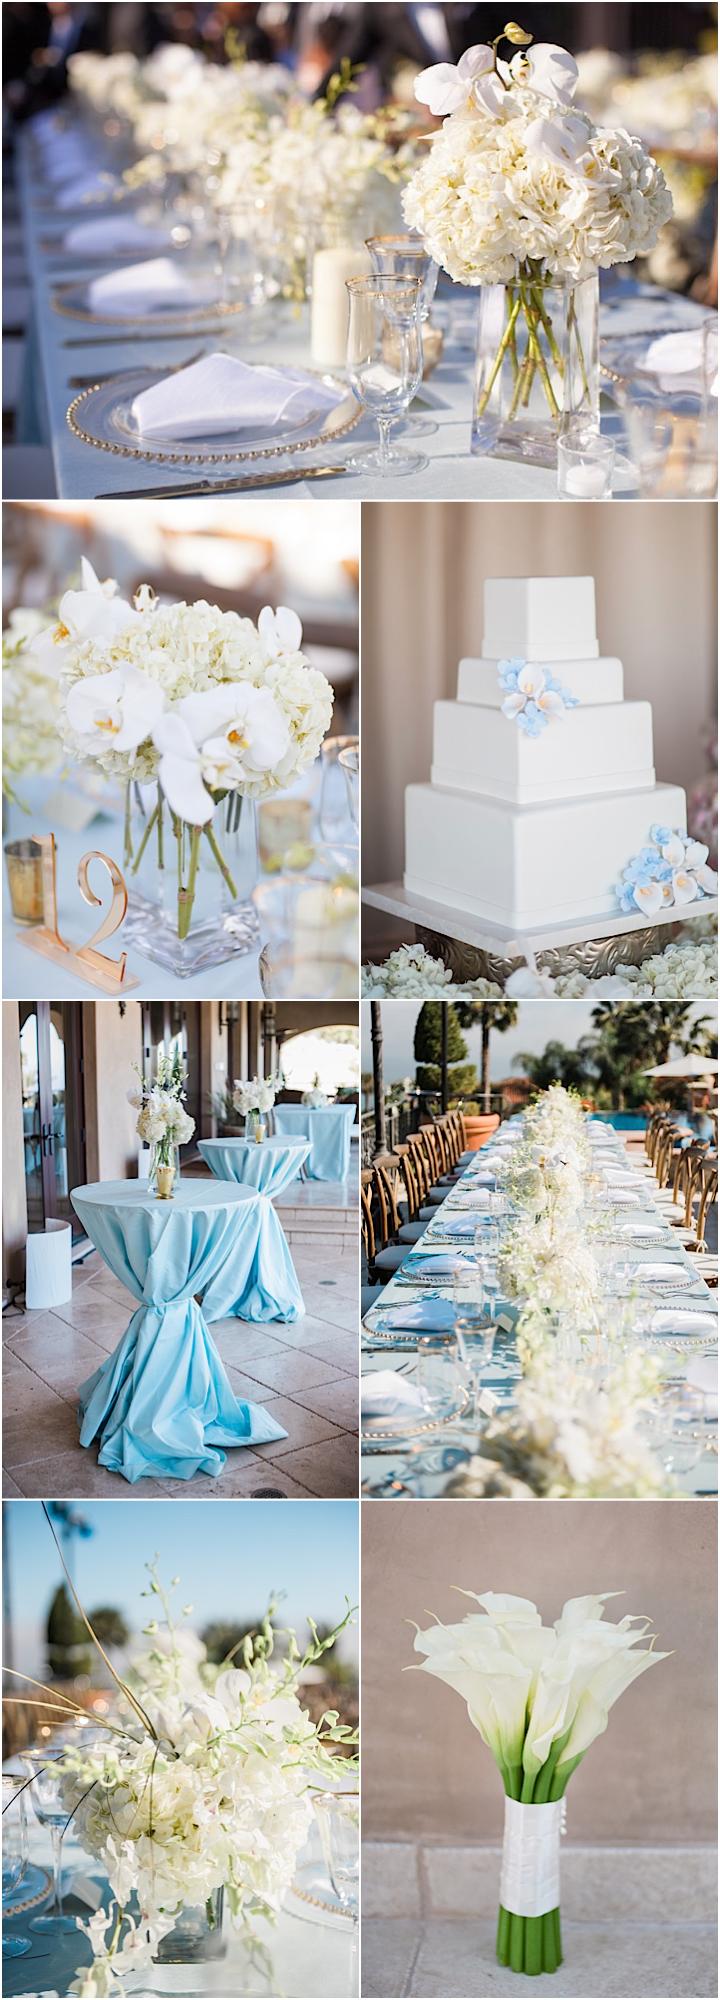 Light blue wedding decoration ideas  Picture Perfect Malibu Wedding  Fun  Pinterest  Rose photography